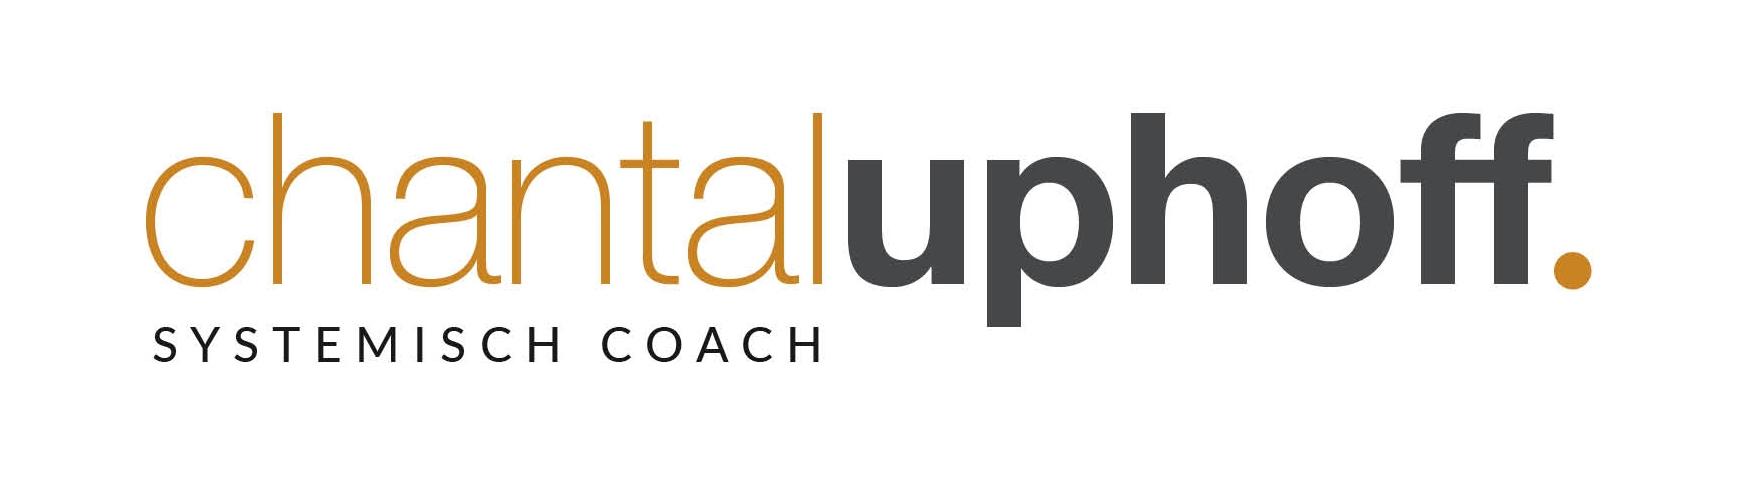 Chantal Uphoff | Systemisch Coach